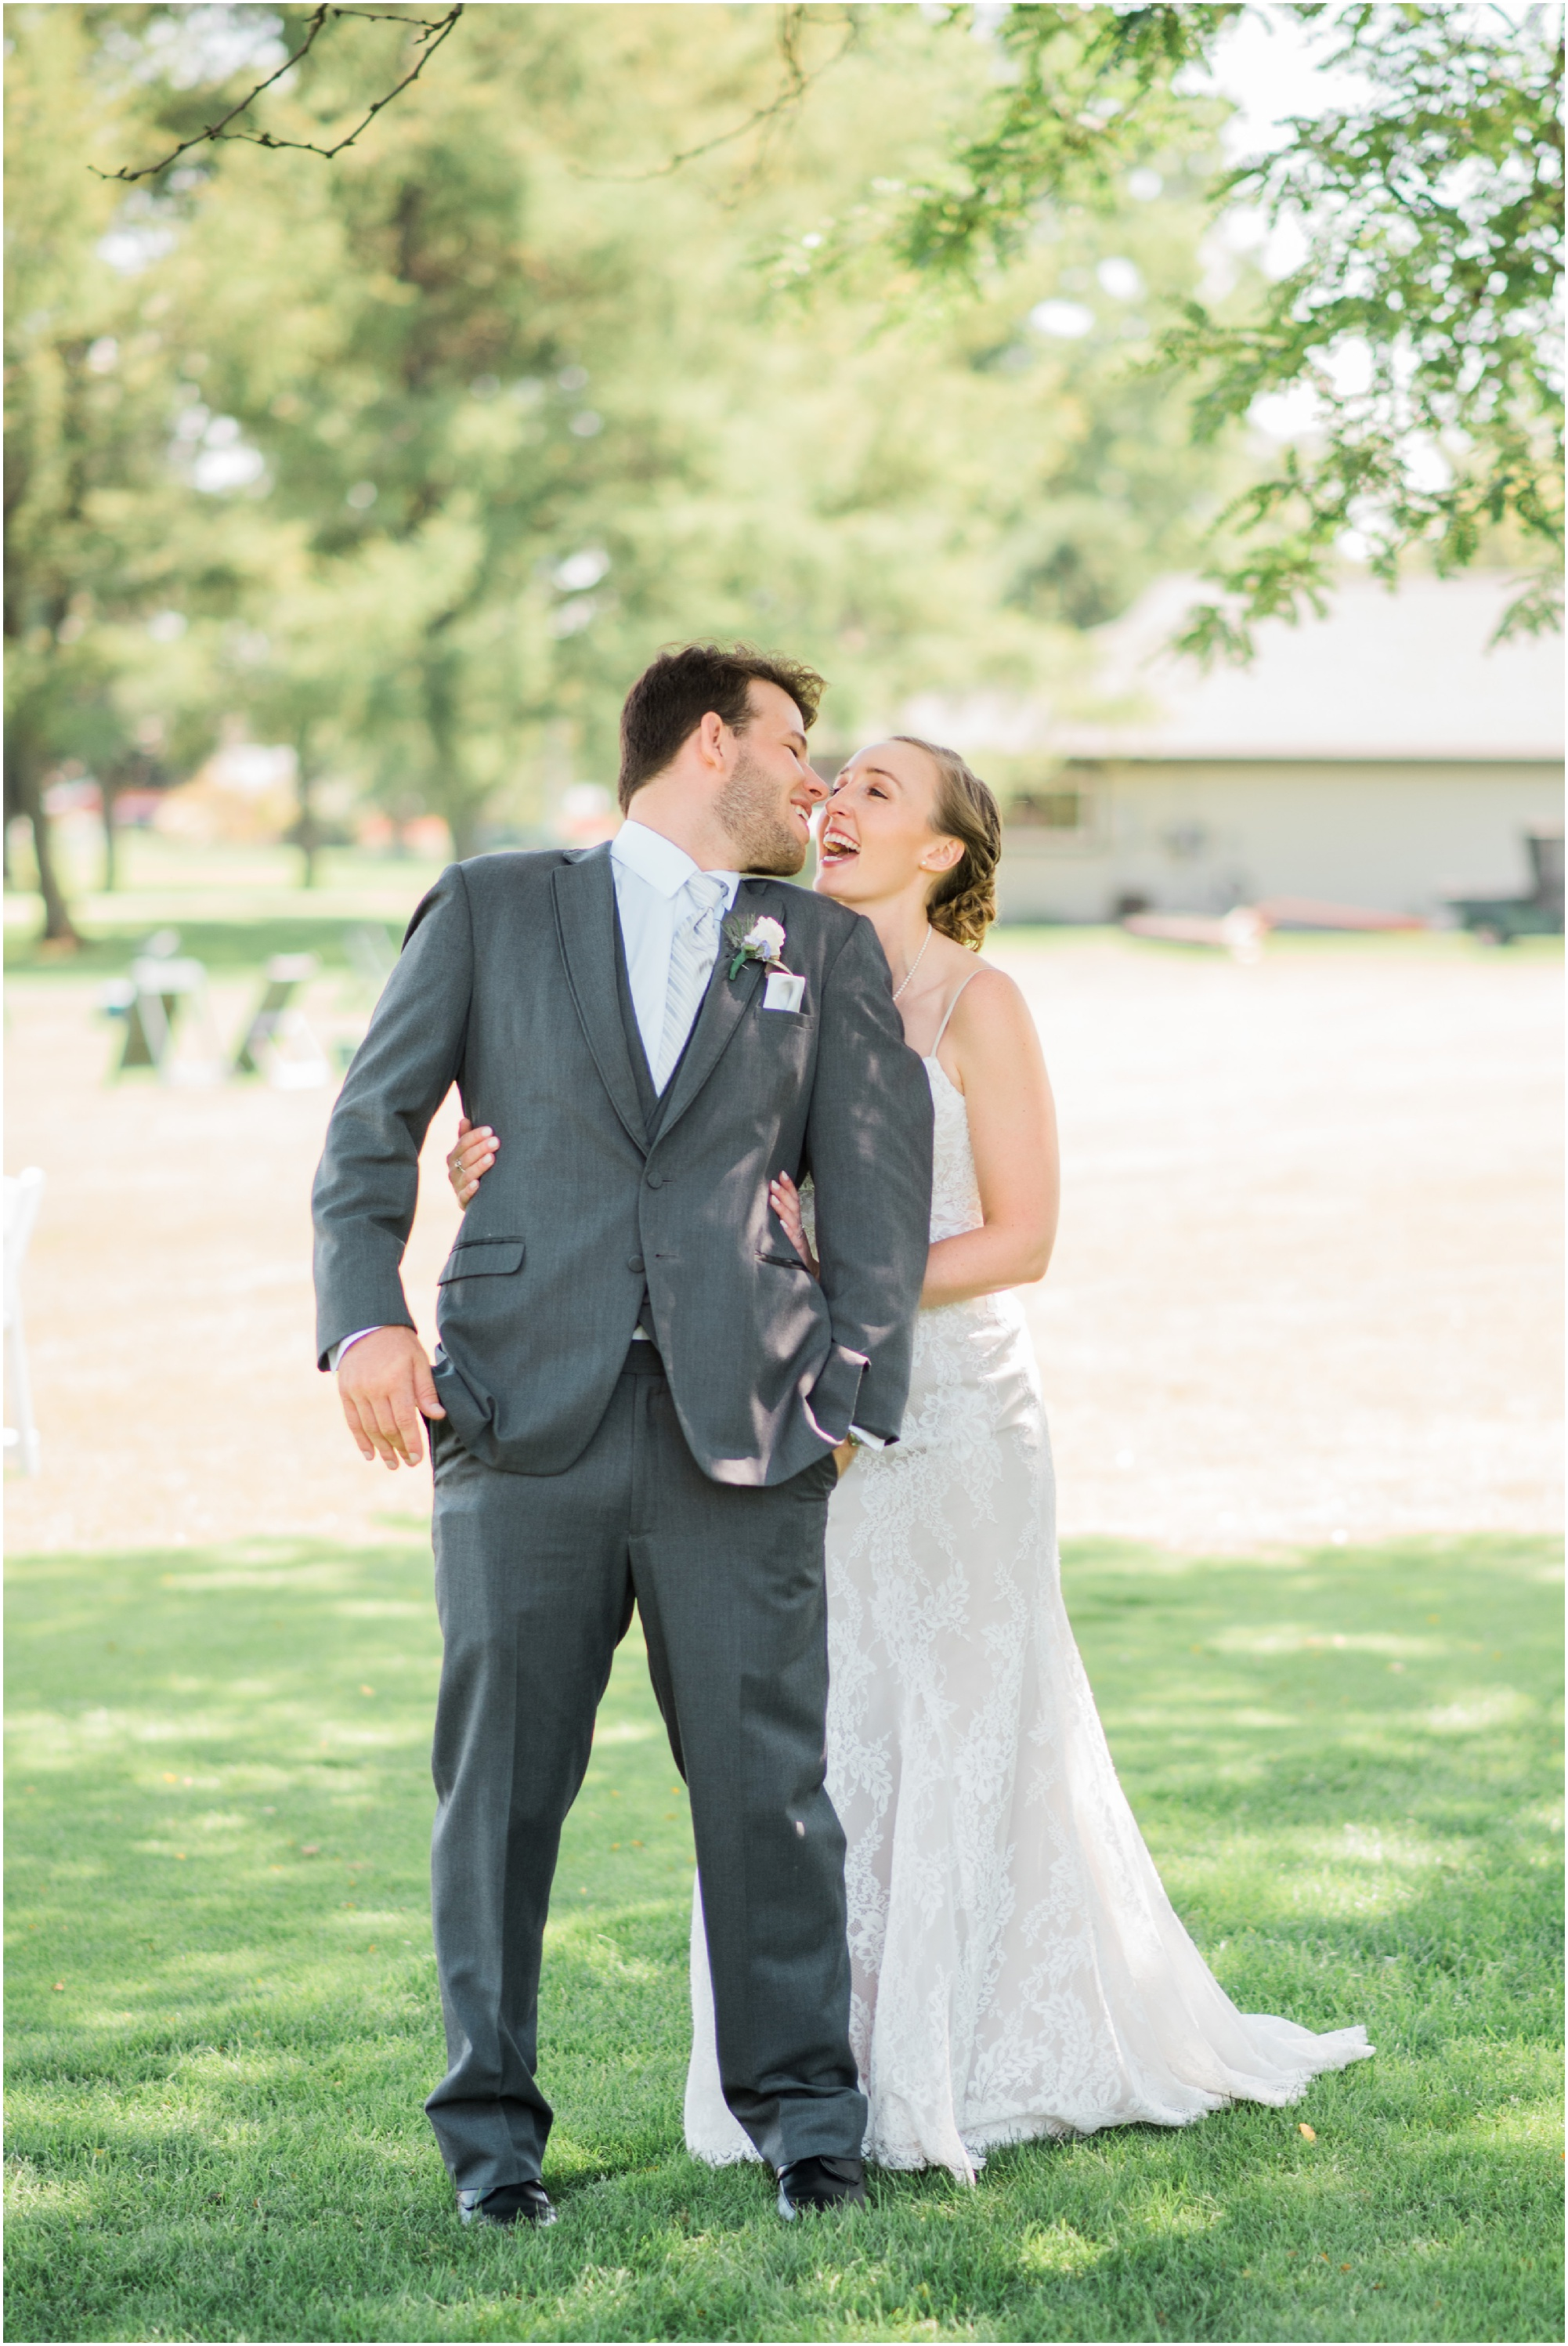 Wisconsin-Wedding-Photographer-Reedsburg-Country-Club-Kaela-and Matt-Wedding-35.jpg